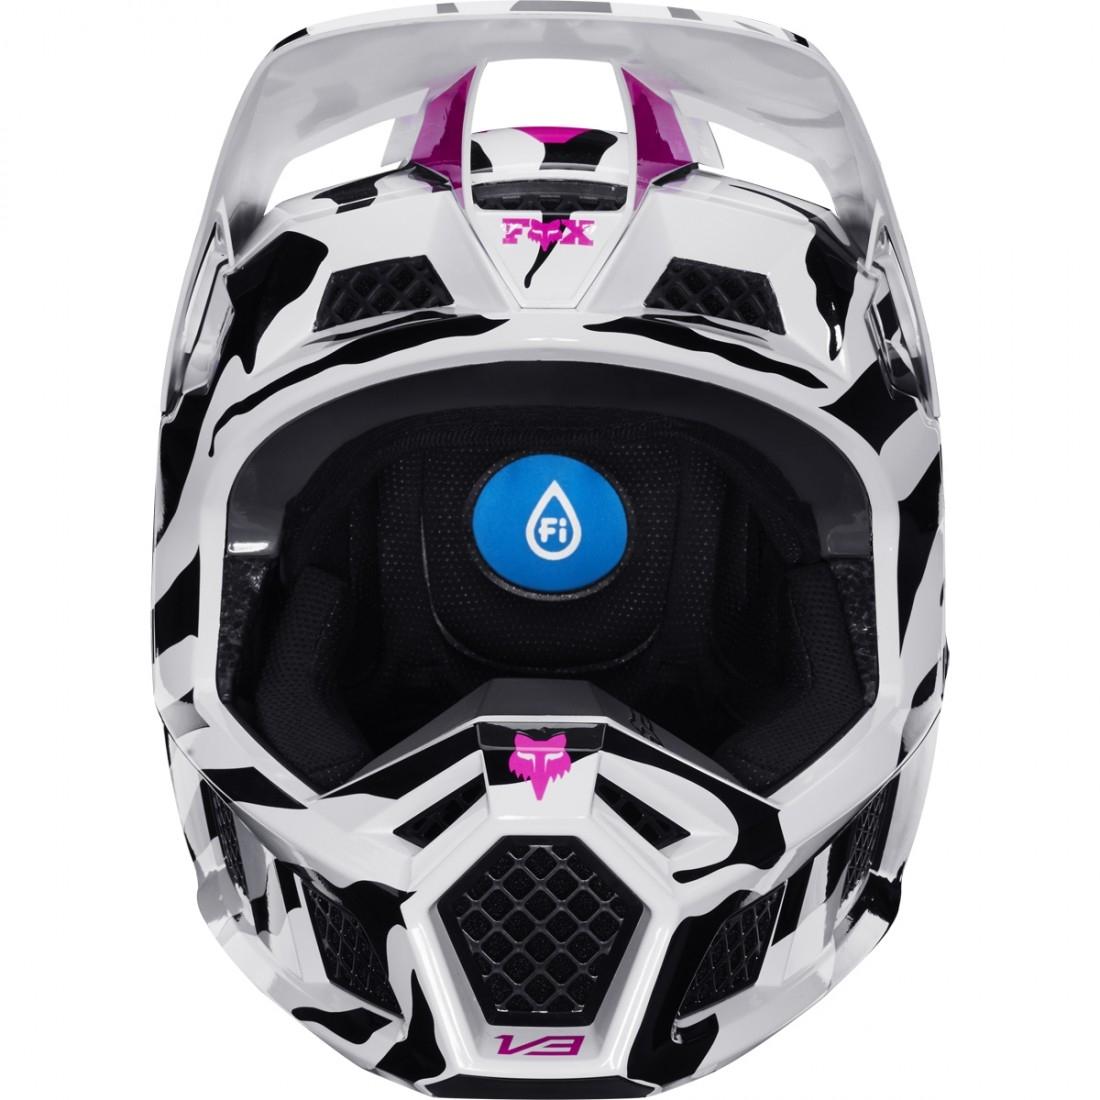 57877bbe FOX V3 2020 Zebra LE Helmet · Motocard